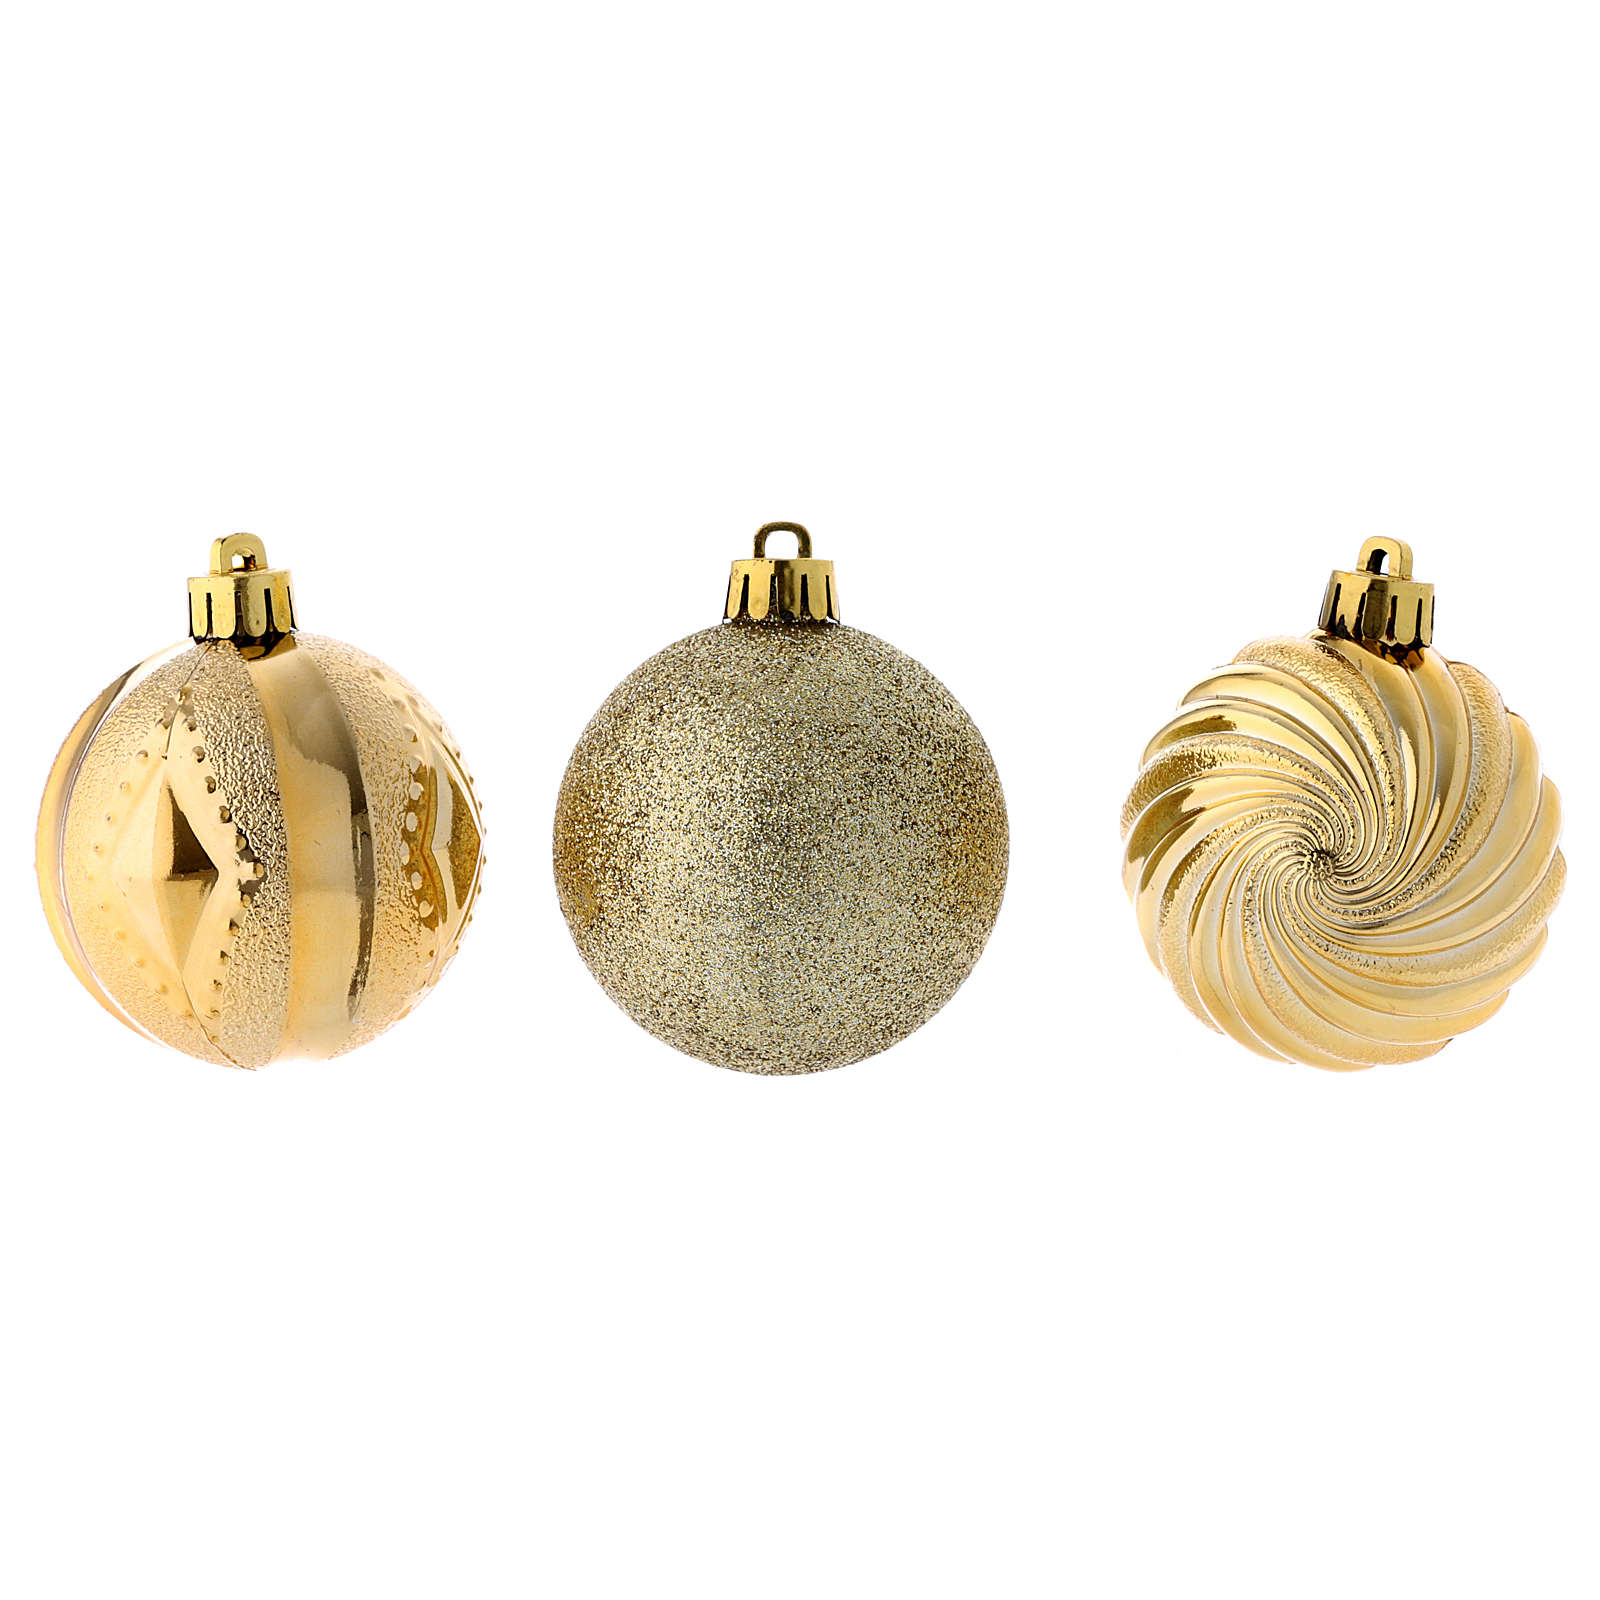 Boules Sapin Noël or 60 mm (vendu par 12) 4